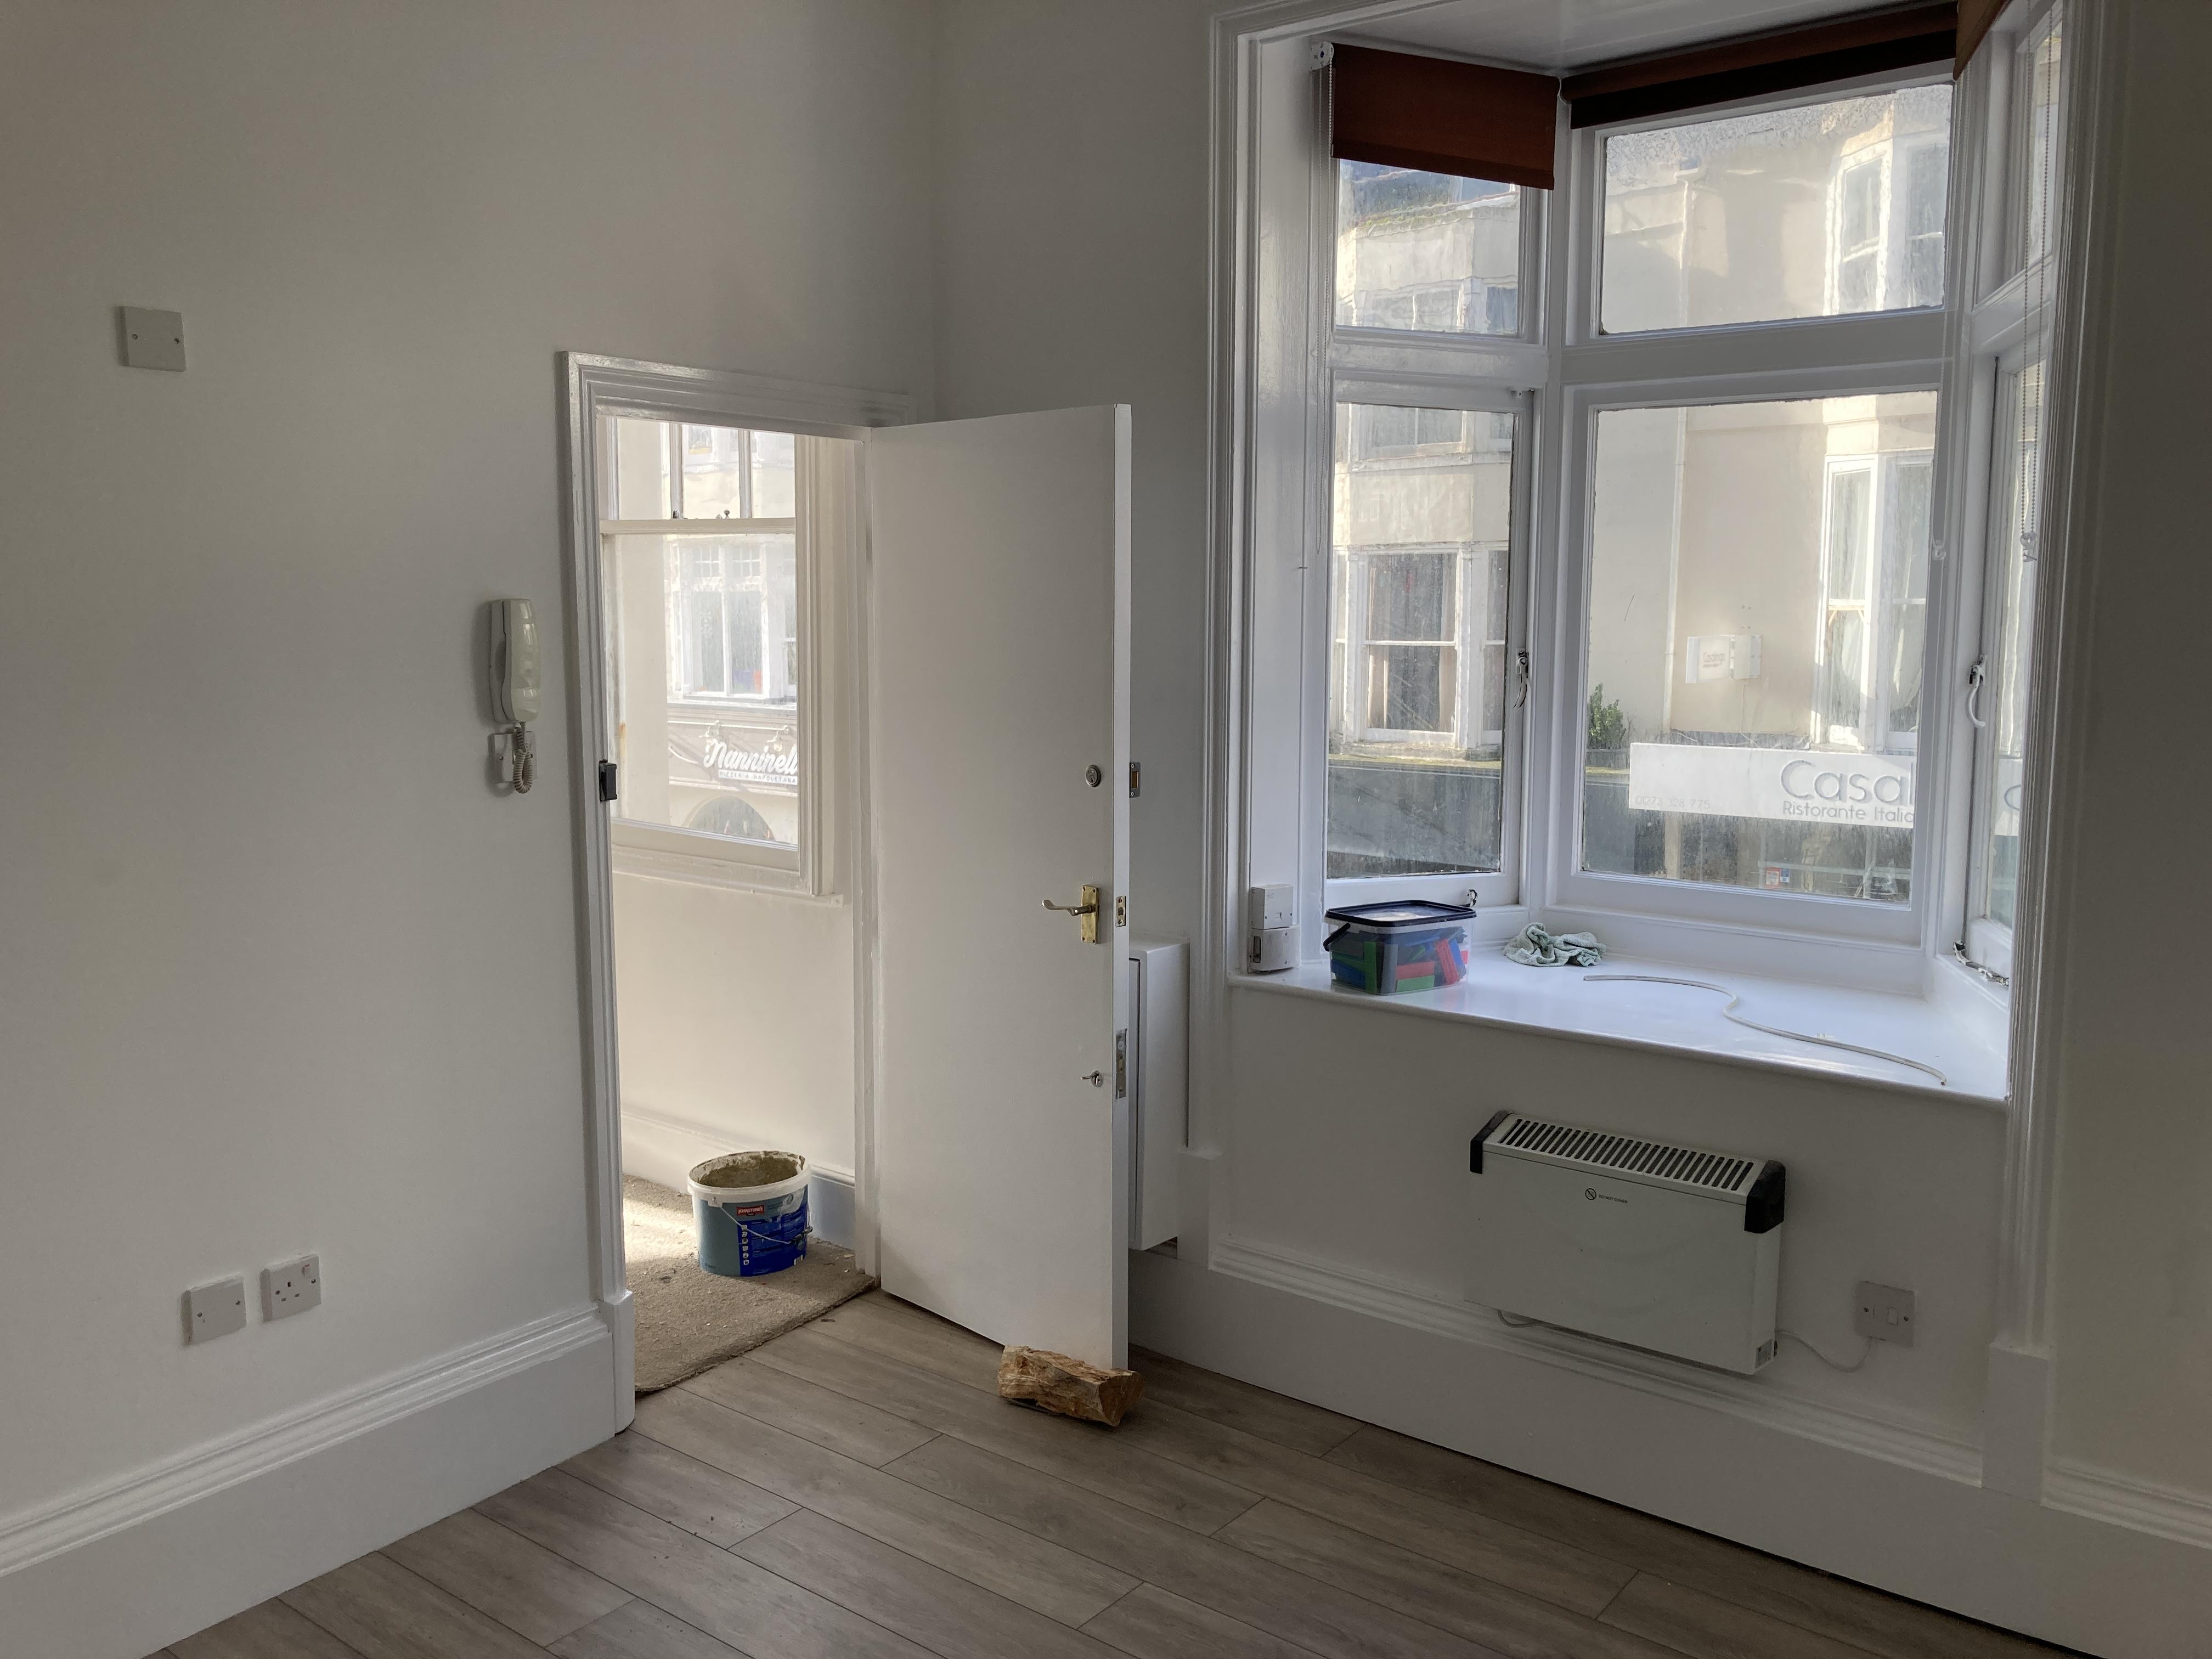 Room 6, 21 Regency Square Brighton image.